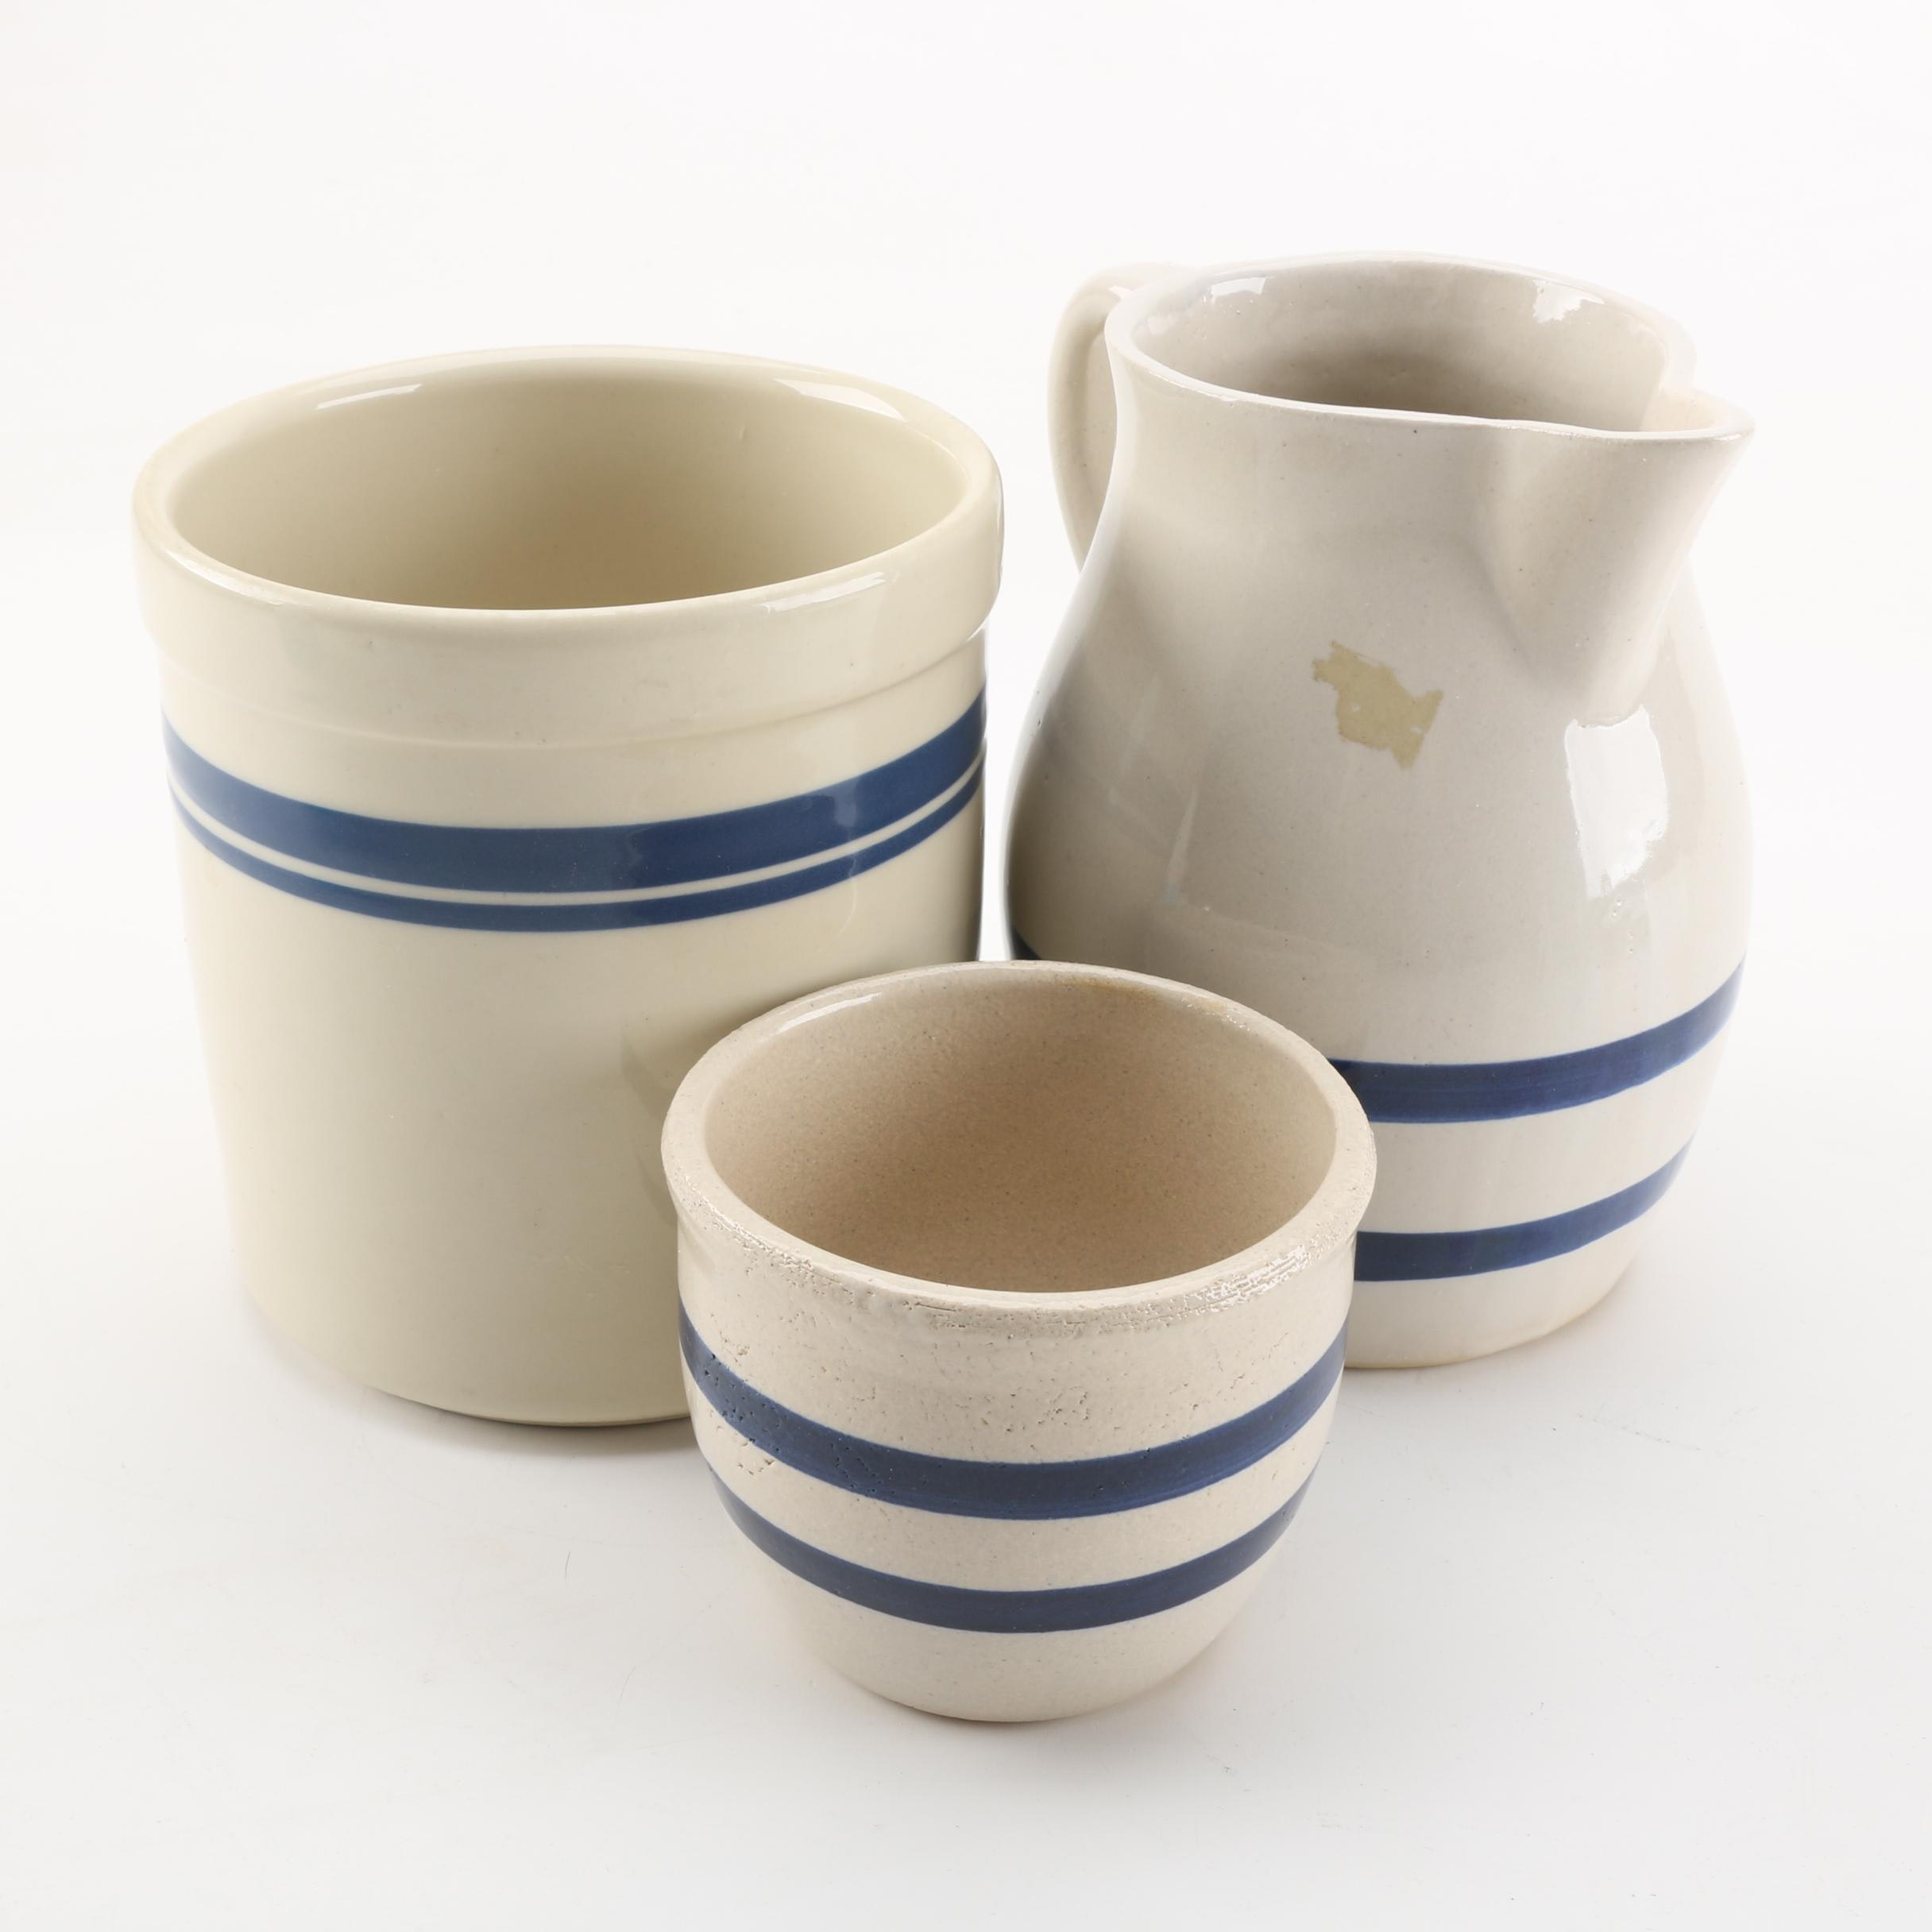 Vintage Stoneware Pitcher, Crock, and Bowl